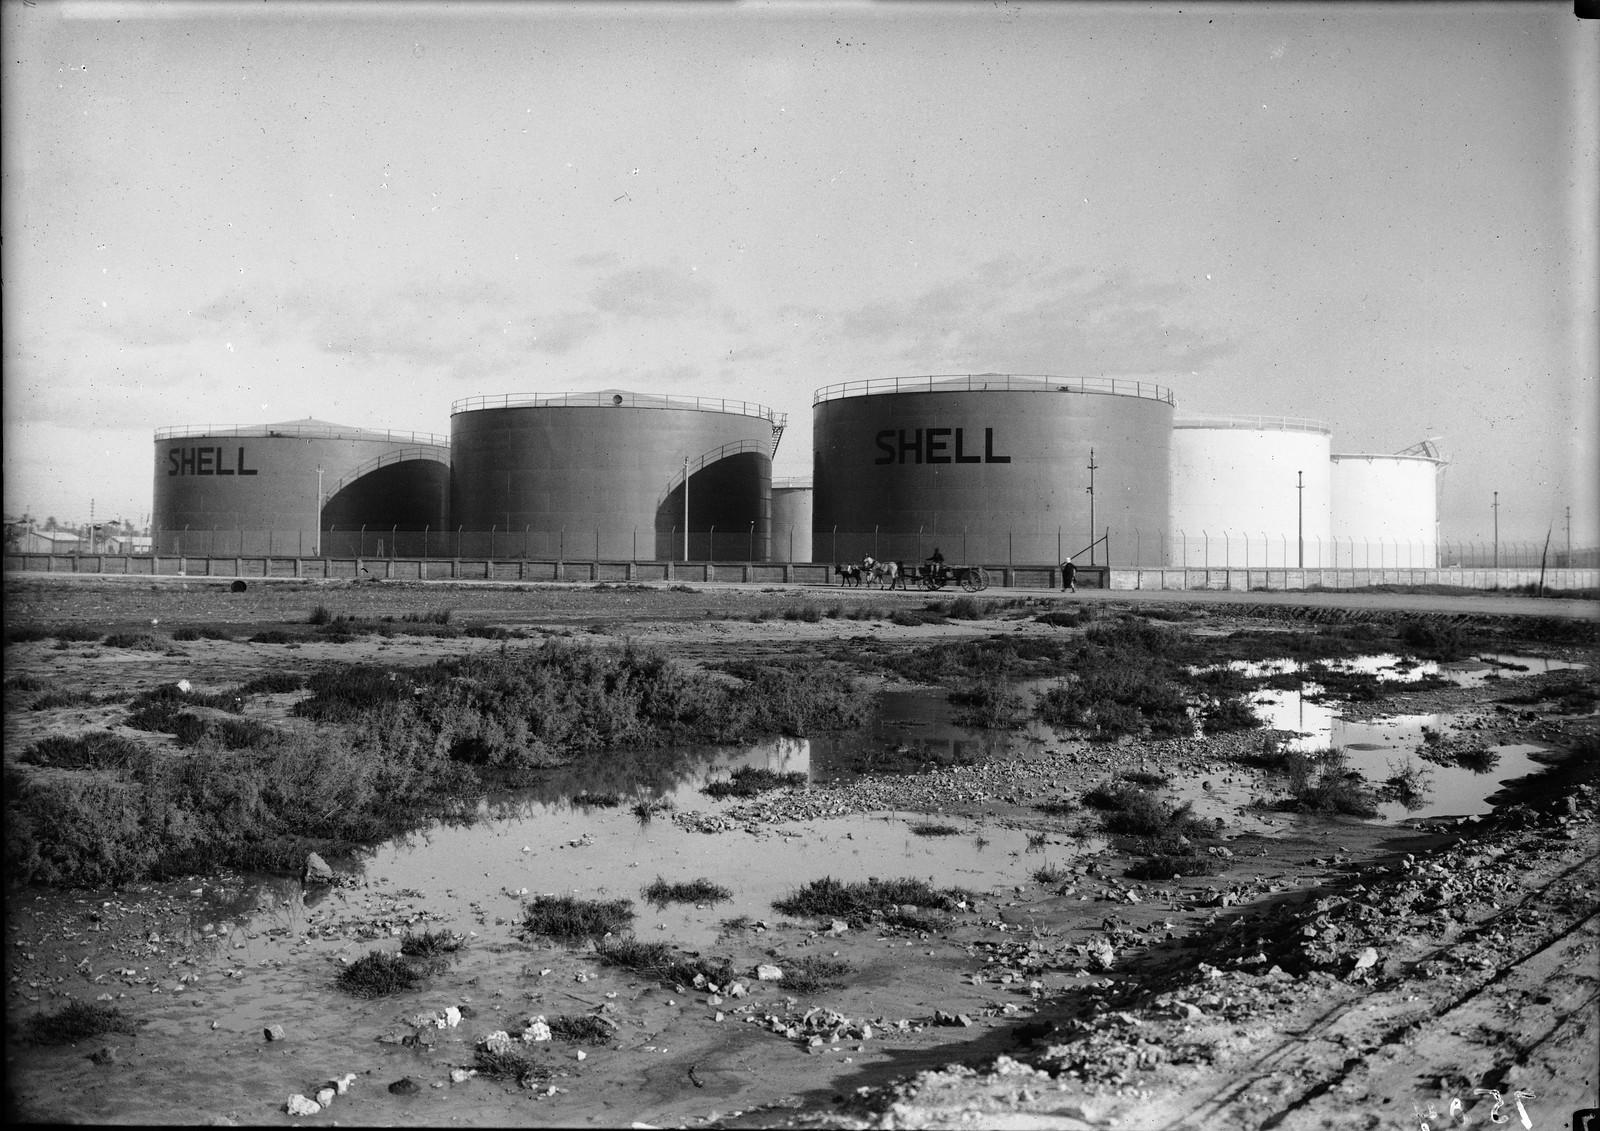 Нефтяные резервуары Шелл возле Хайфы